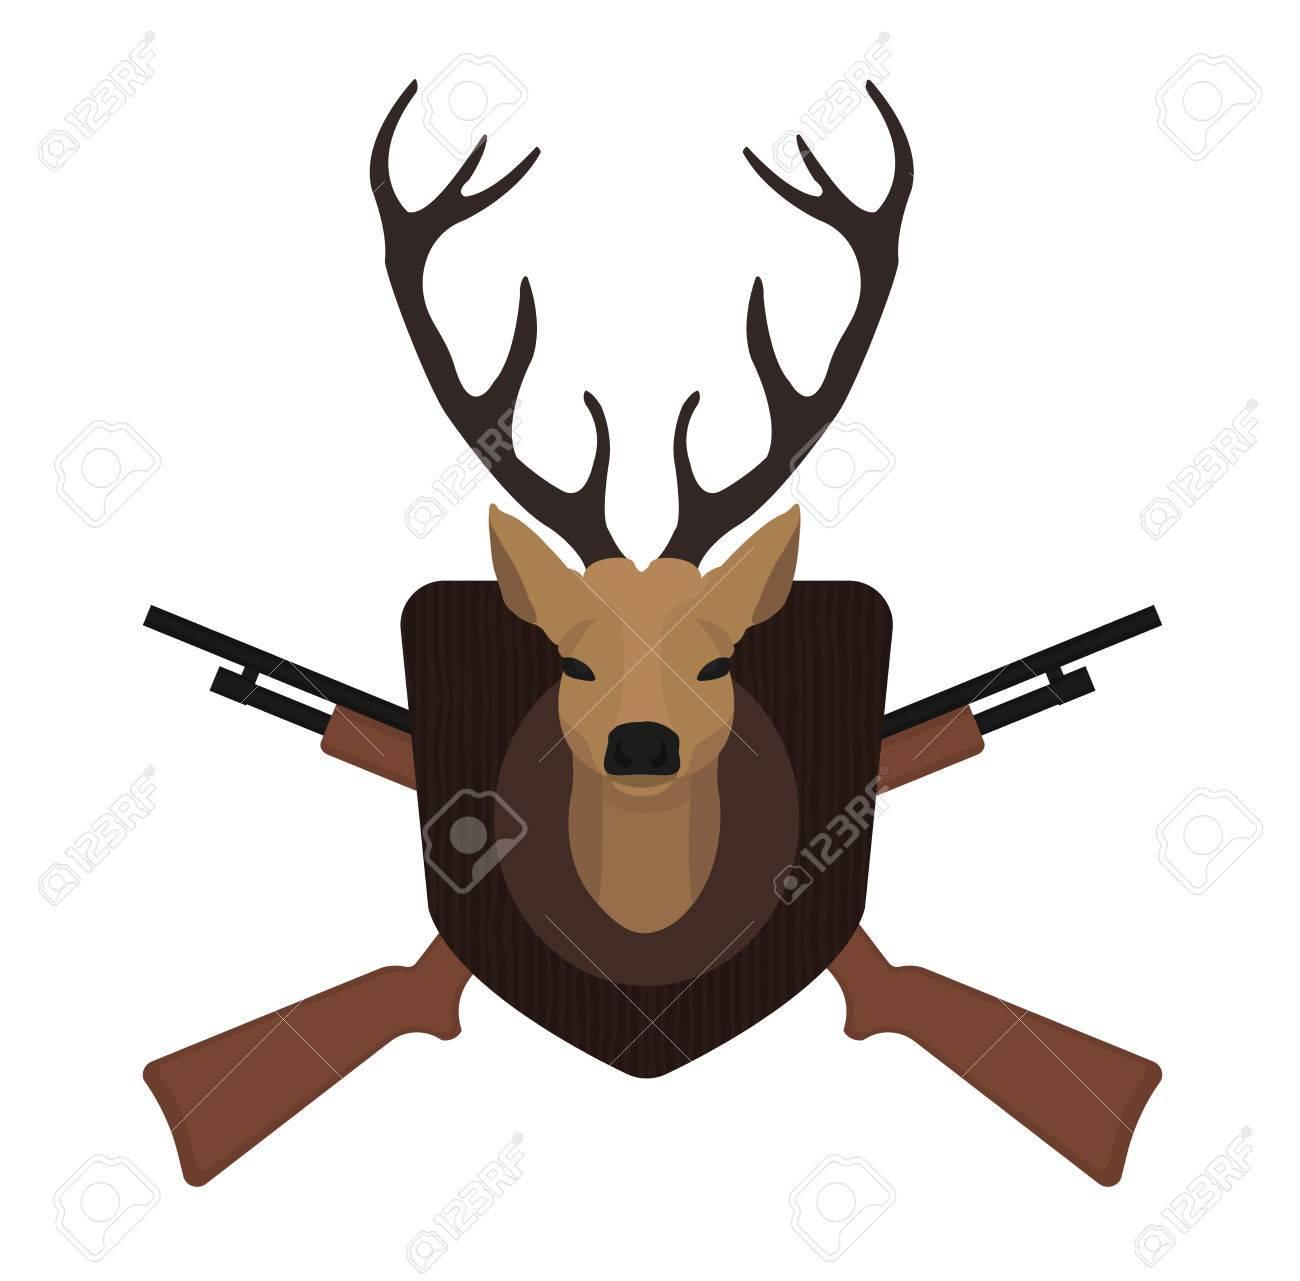 1300x1281 Hunting Trophy. Stuffed Taxidermy Deer Head With Big Antlers